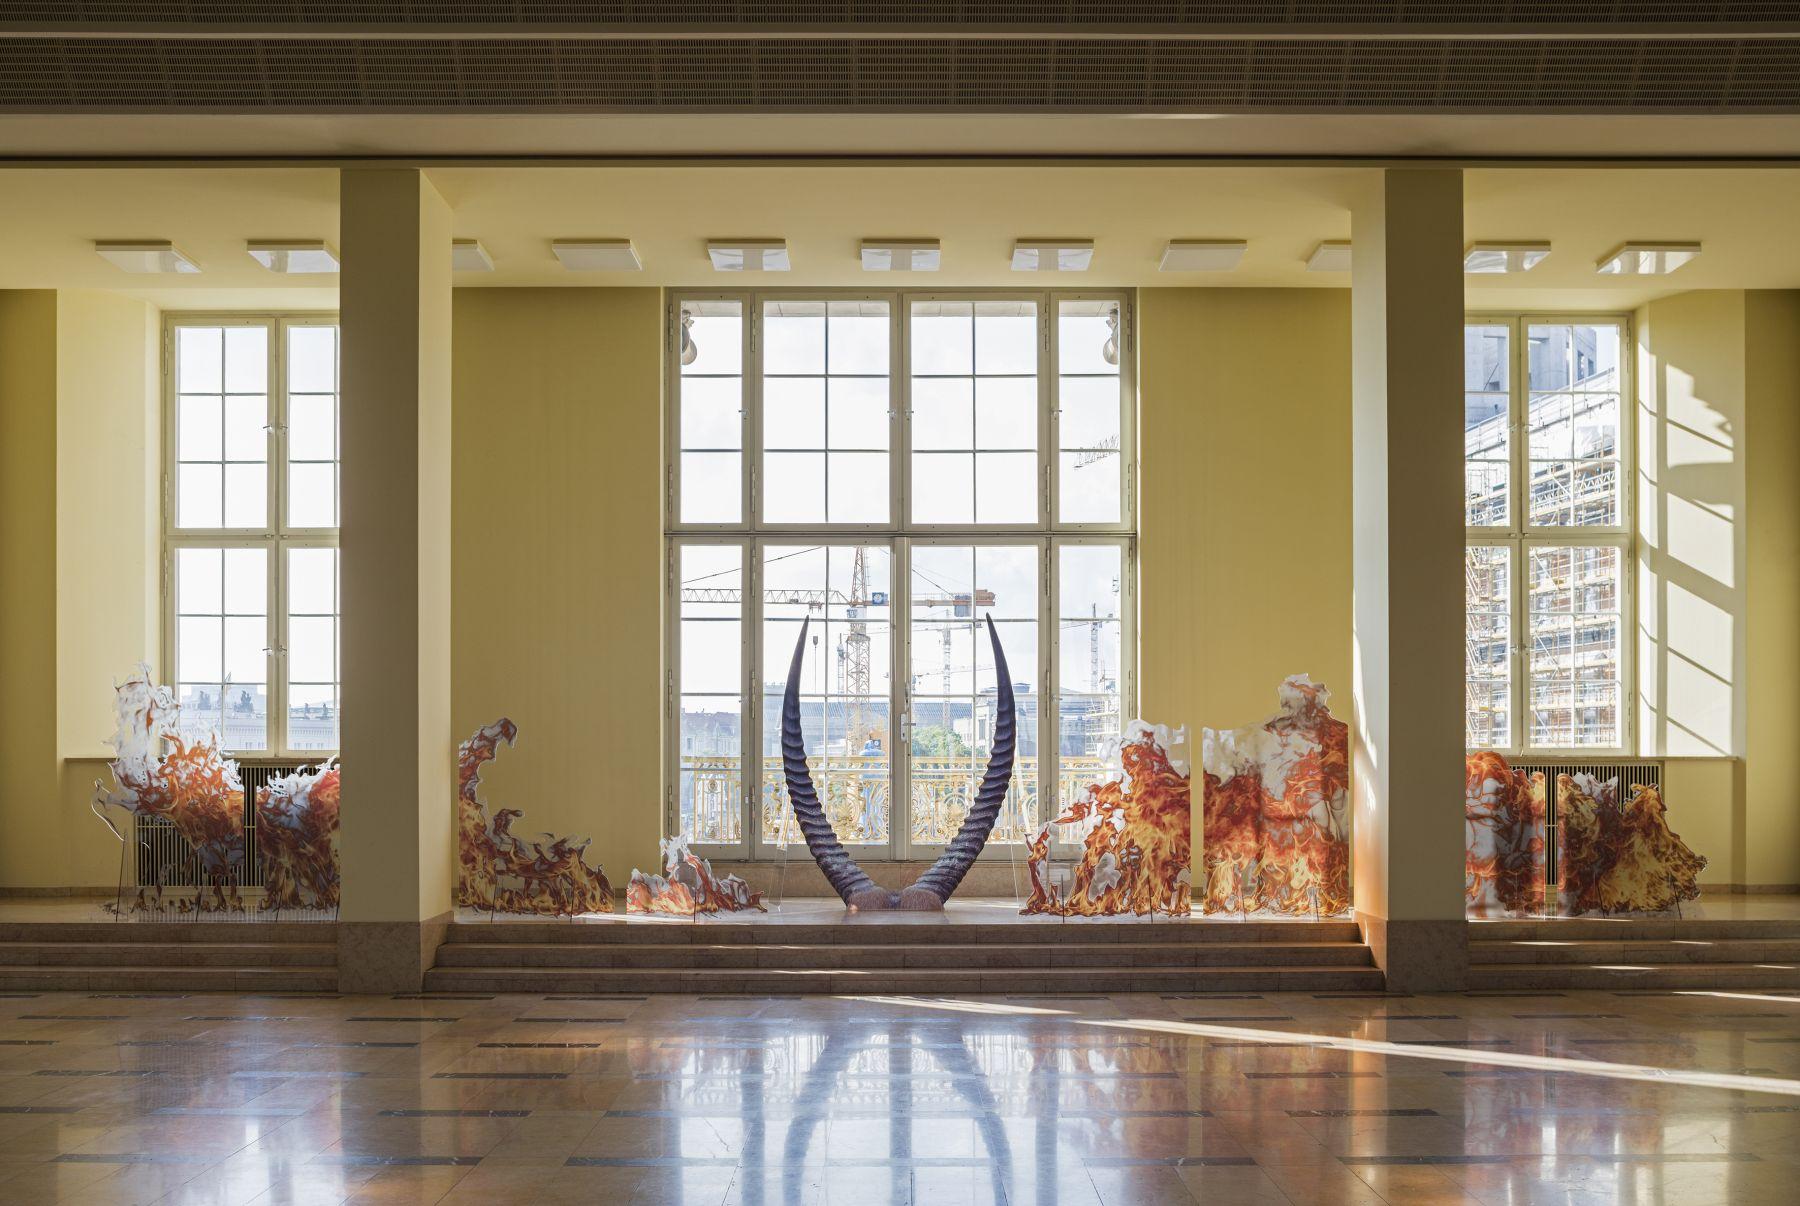 Katja Novitskova, Installation view, 9th Berlin Biennale, ESMT, Berlin, 2016